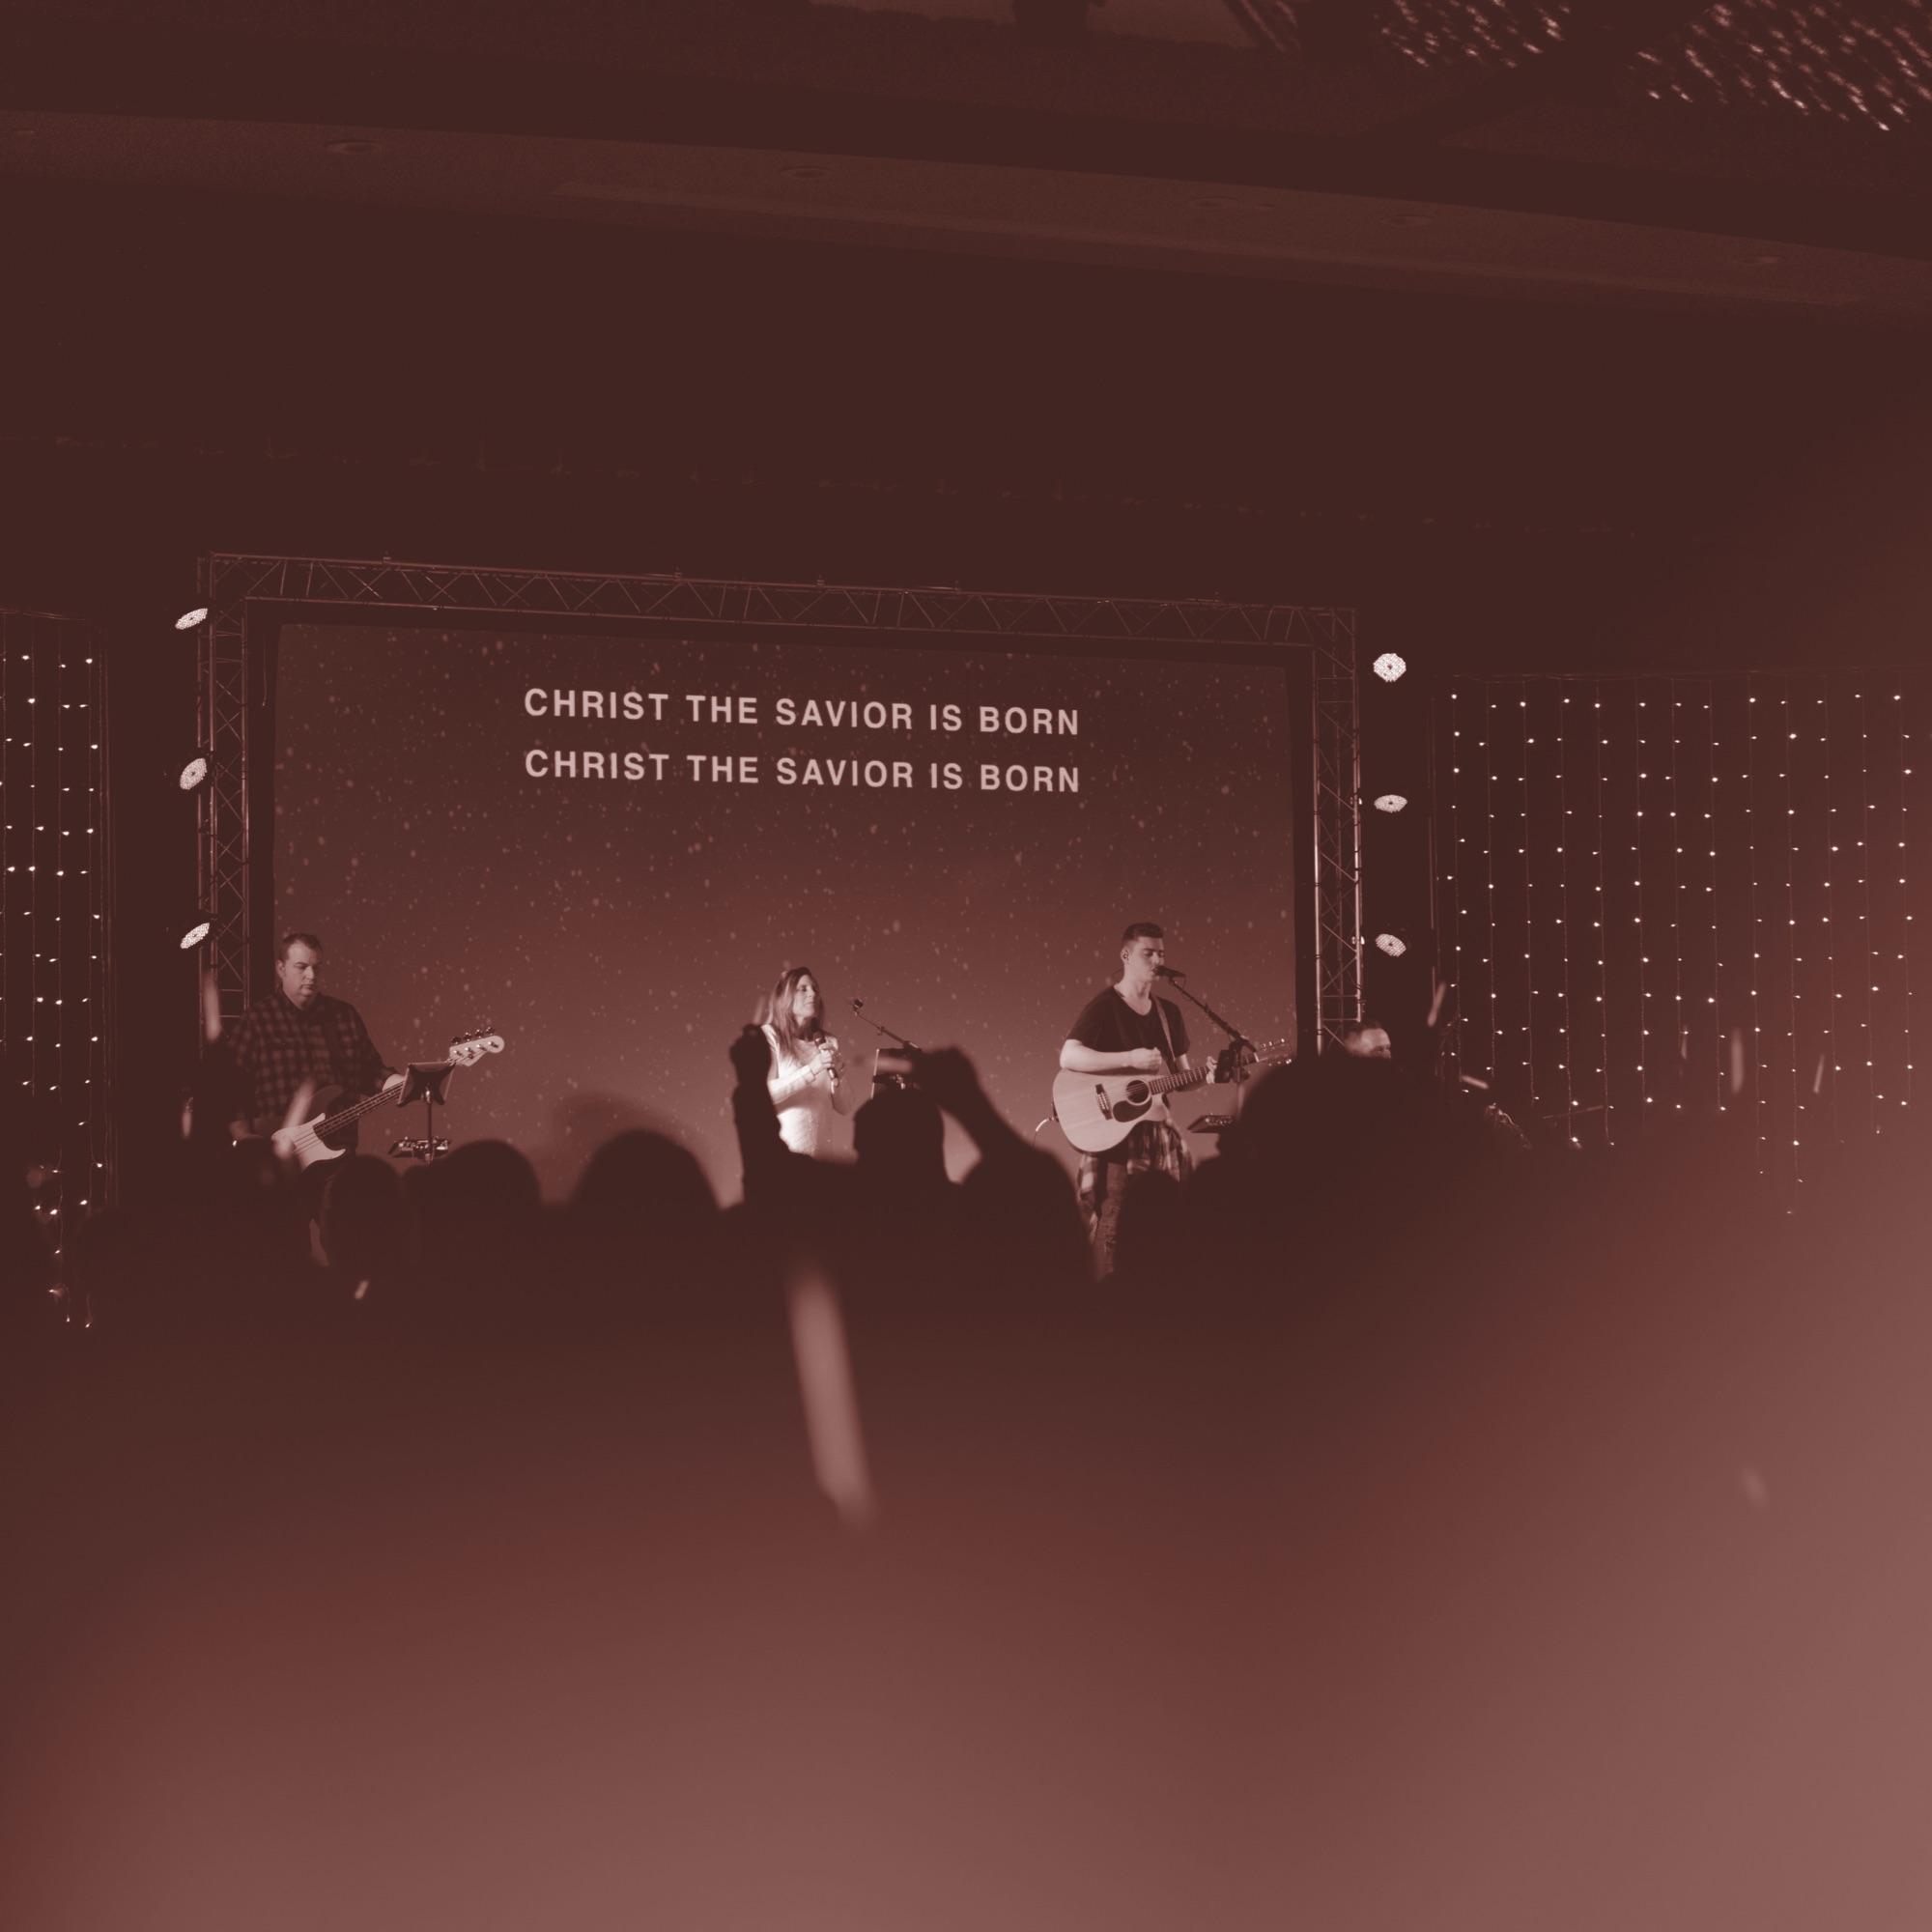 Worship service singing Christ The Savior